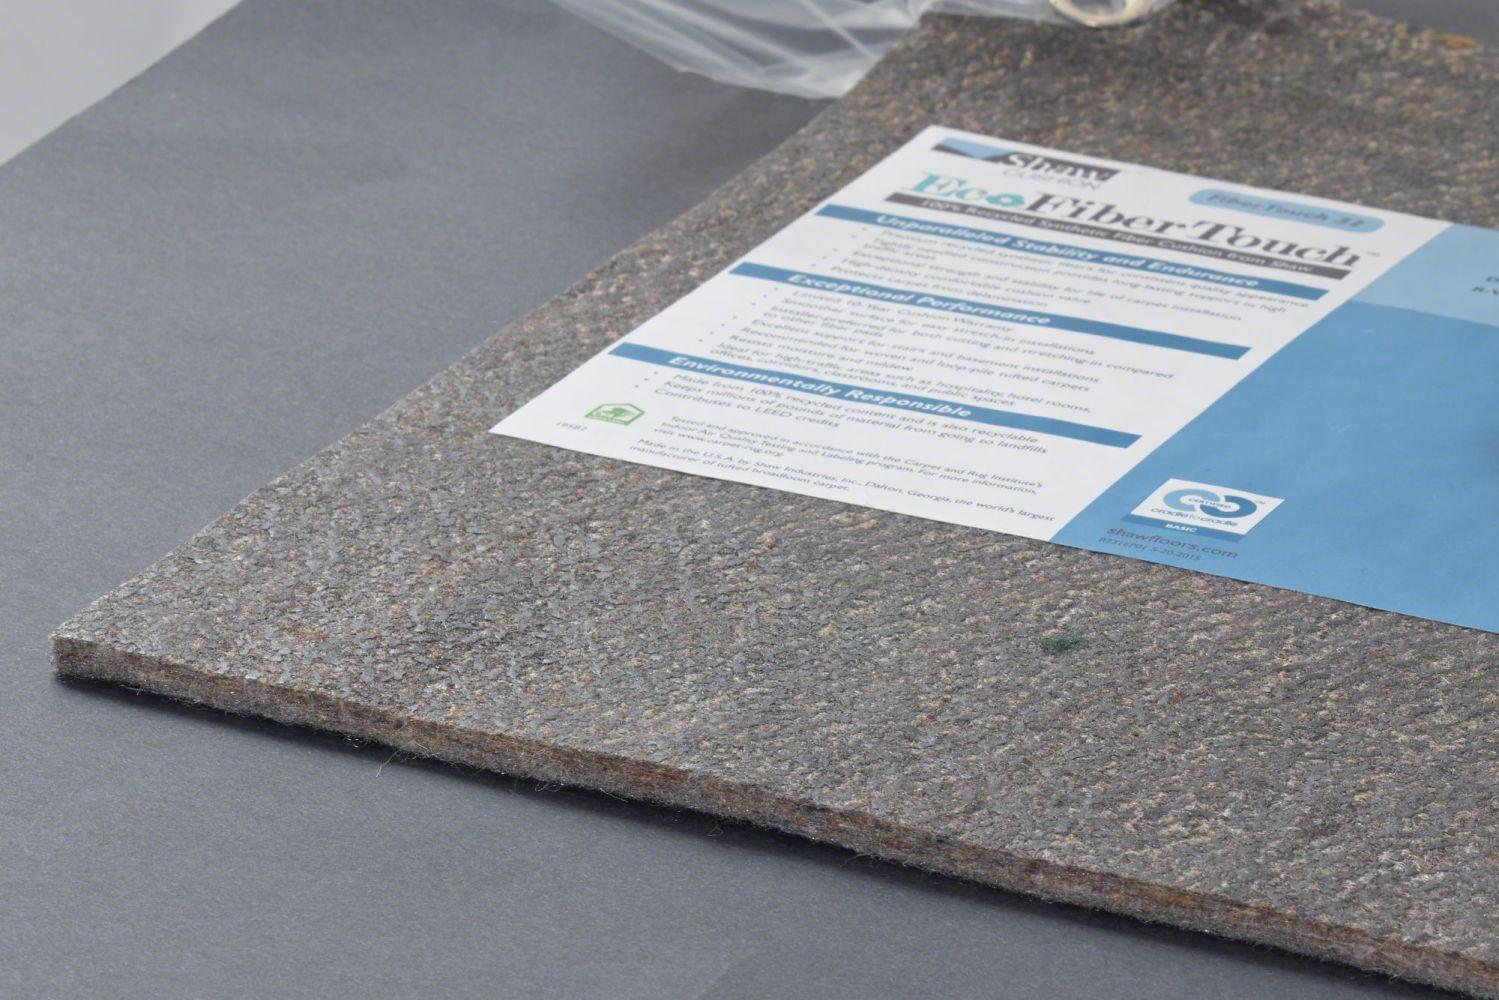 Shaw Floors Eco Edge Cushion Fibertouch 32-6 Grey 00001_320FT